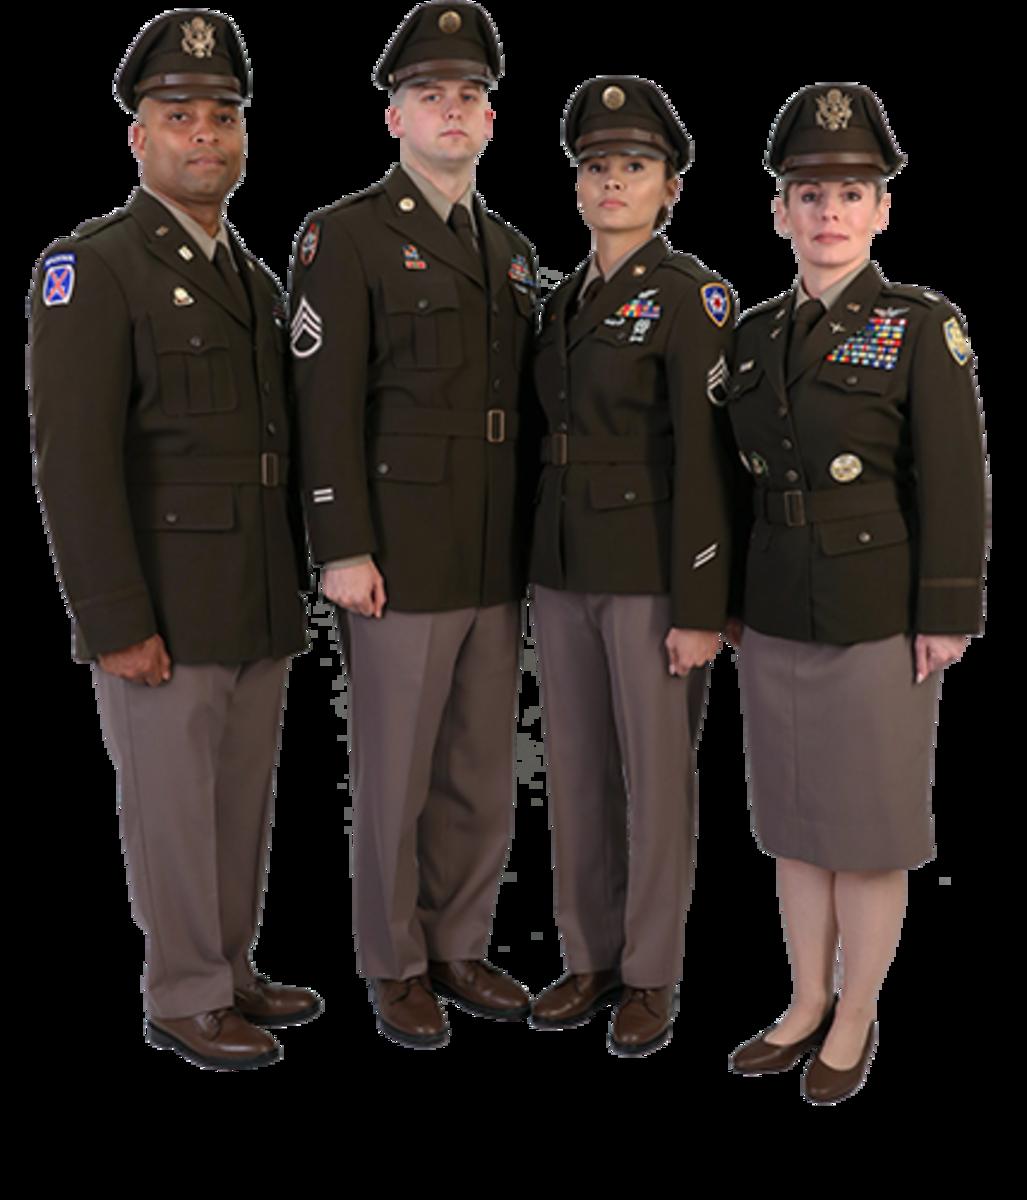 WWII-inspired prototype uniforms